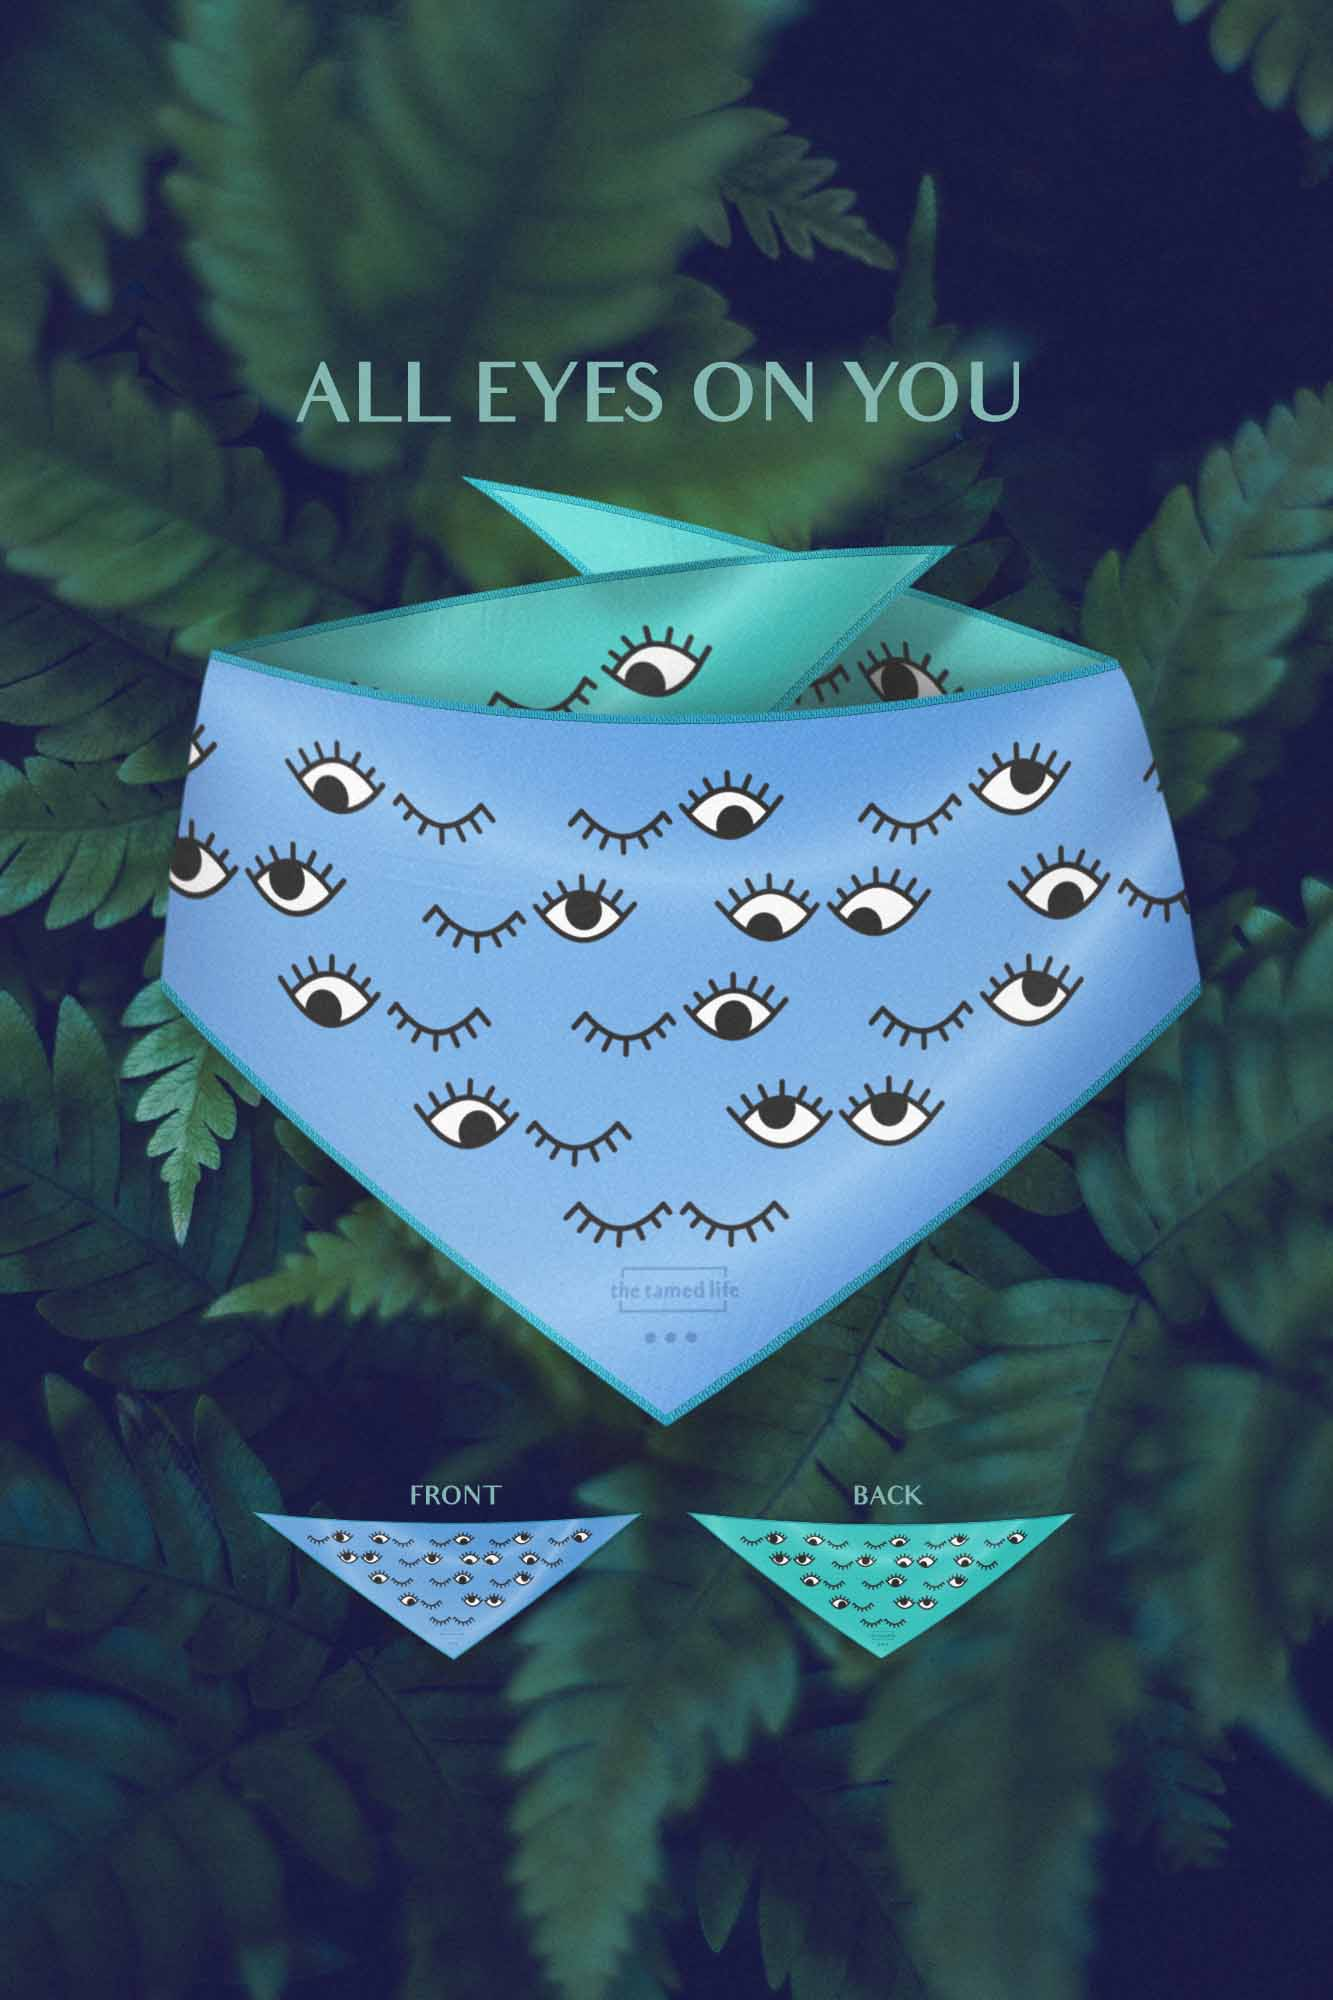 ttl_0001alleyesonyou_visual.jpg